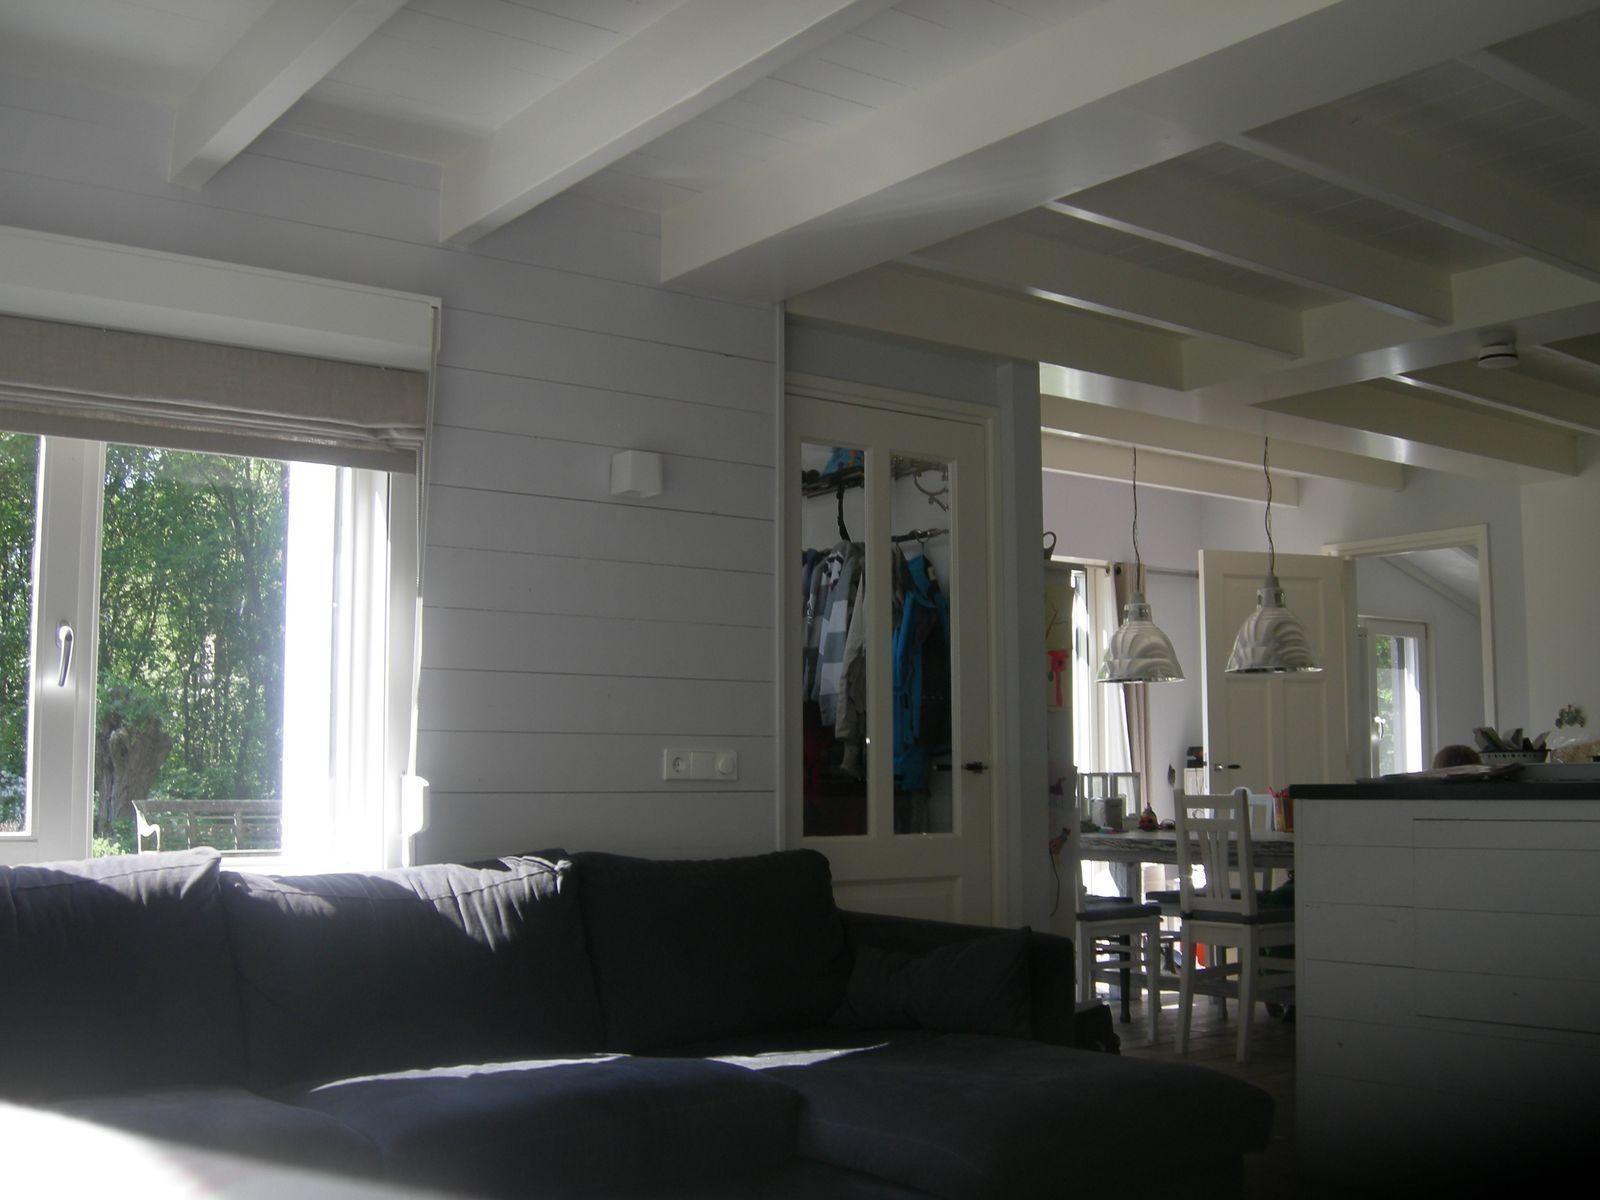 Holidayhome - Puijendijk 2 | Groede